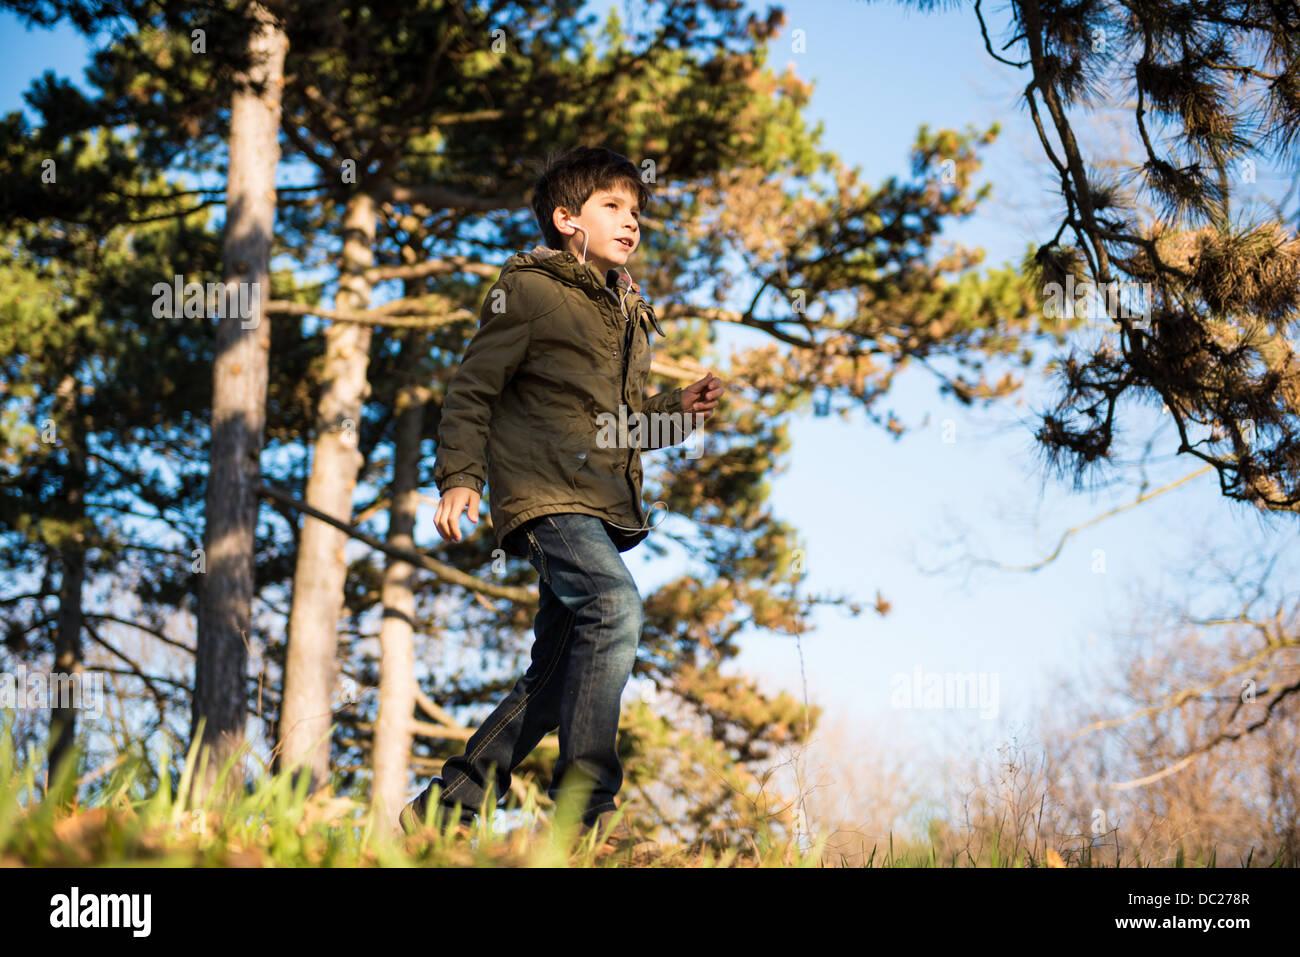 Boy walking in countryside - Stock Image